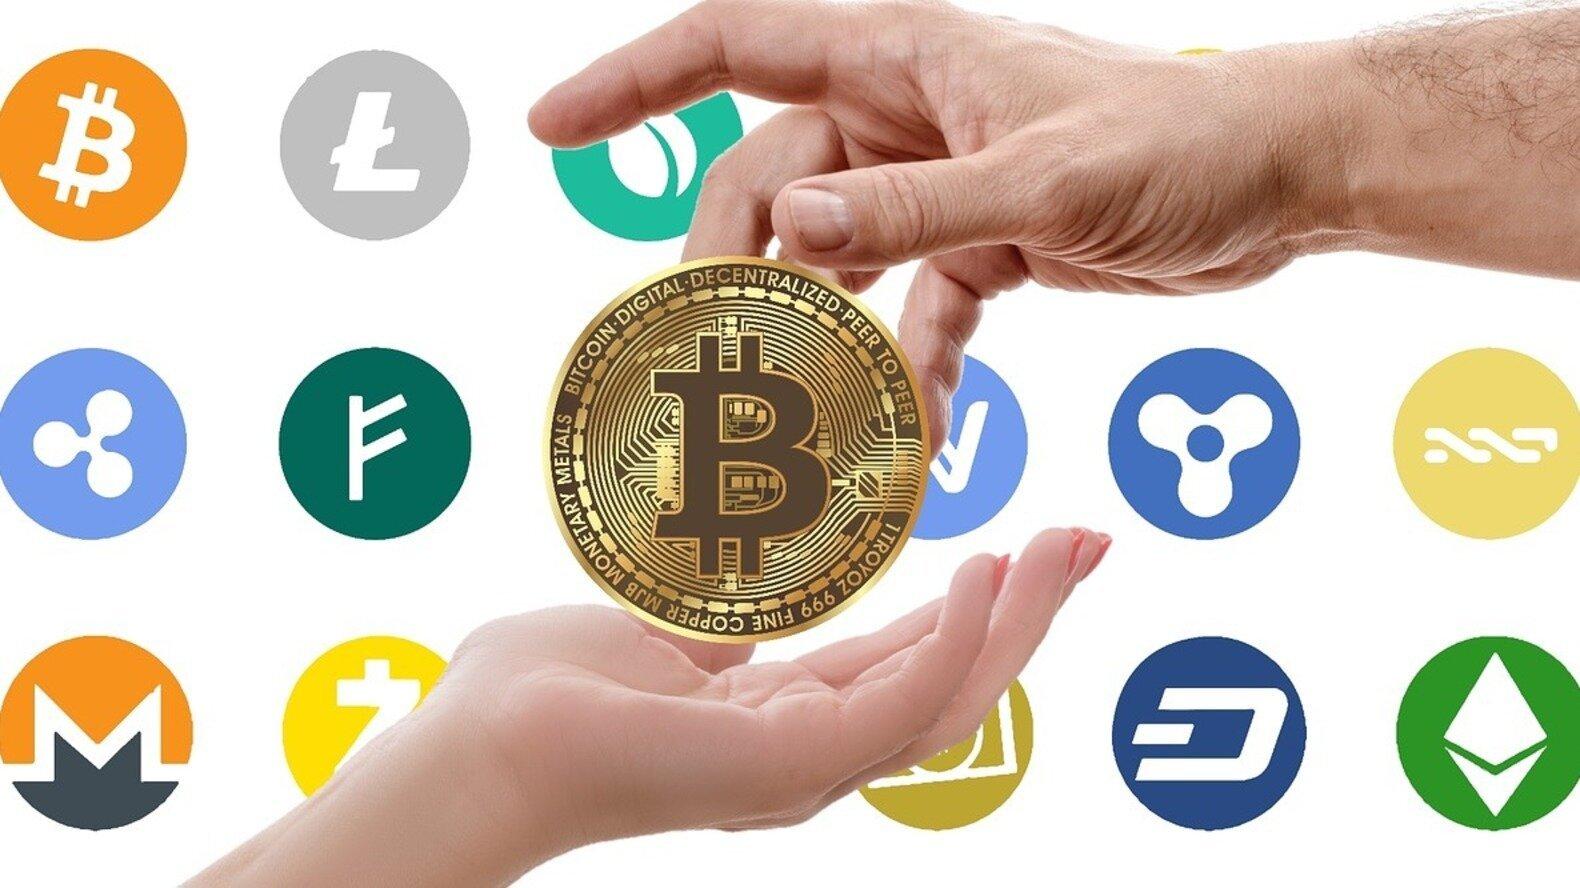 Precautions before investing in Cryptocurrencies